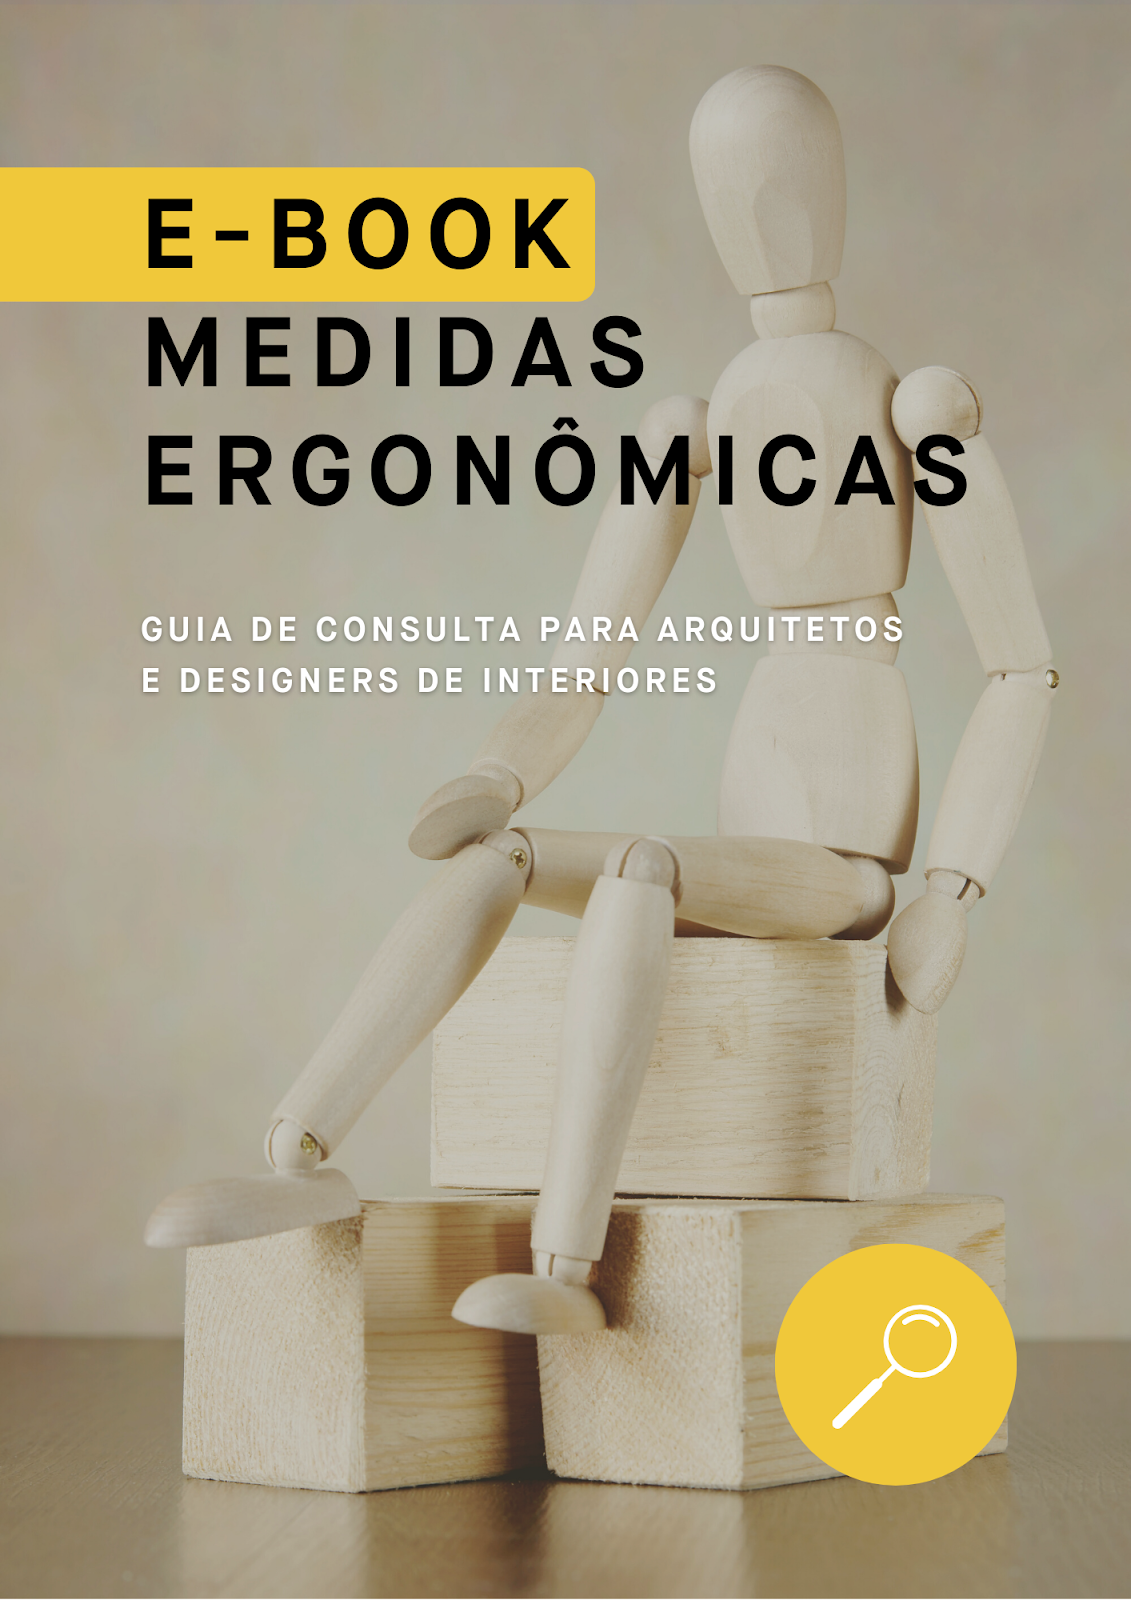 ergonomia na arquitetura - ebook